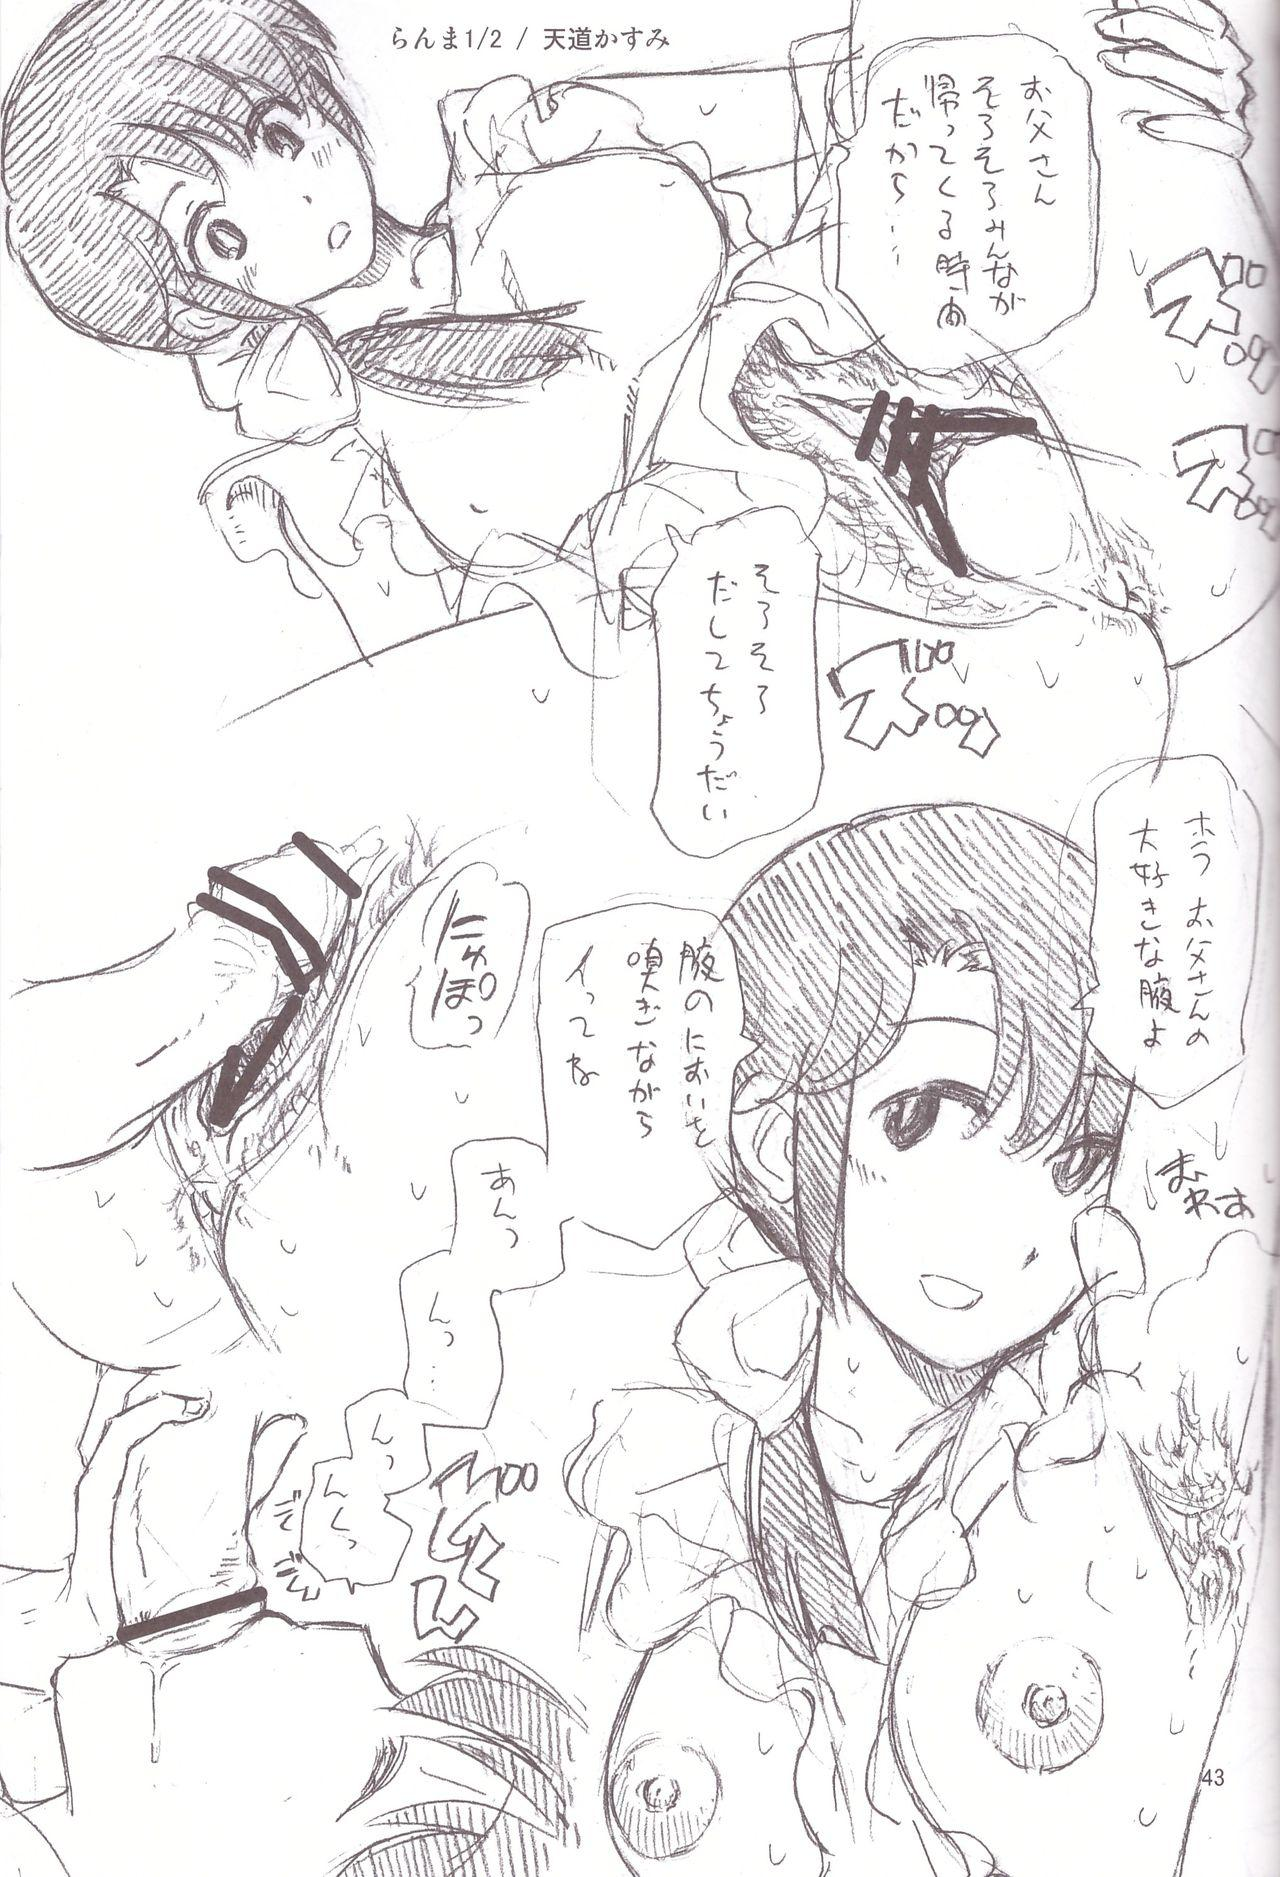 Hentai Fetish's 2 42